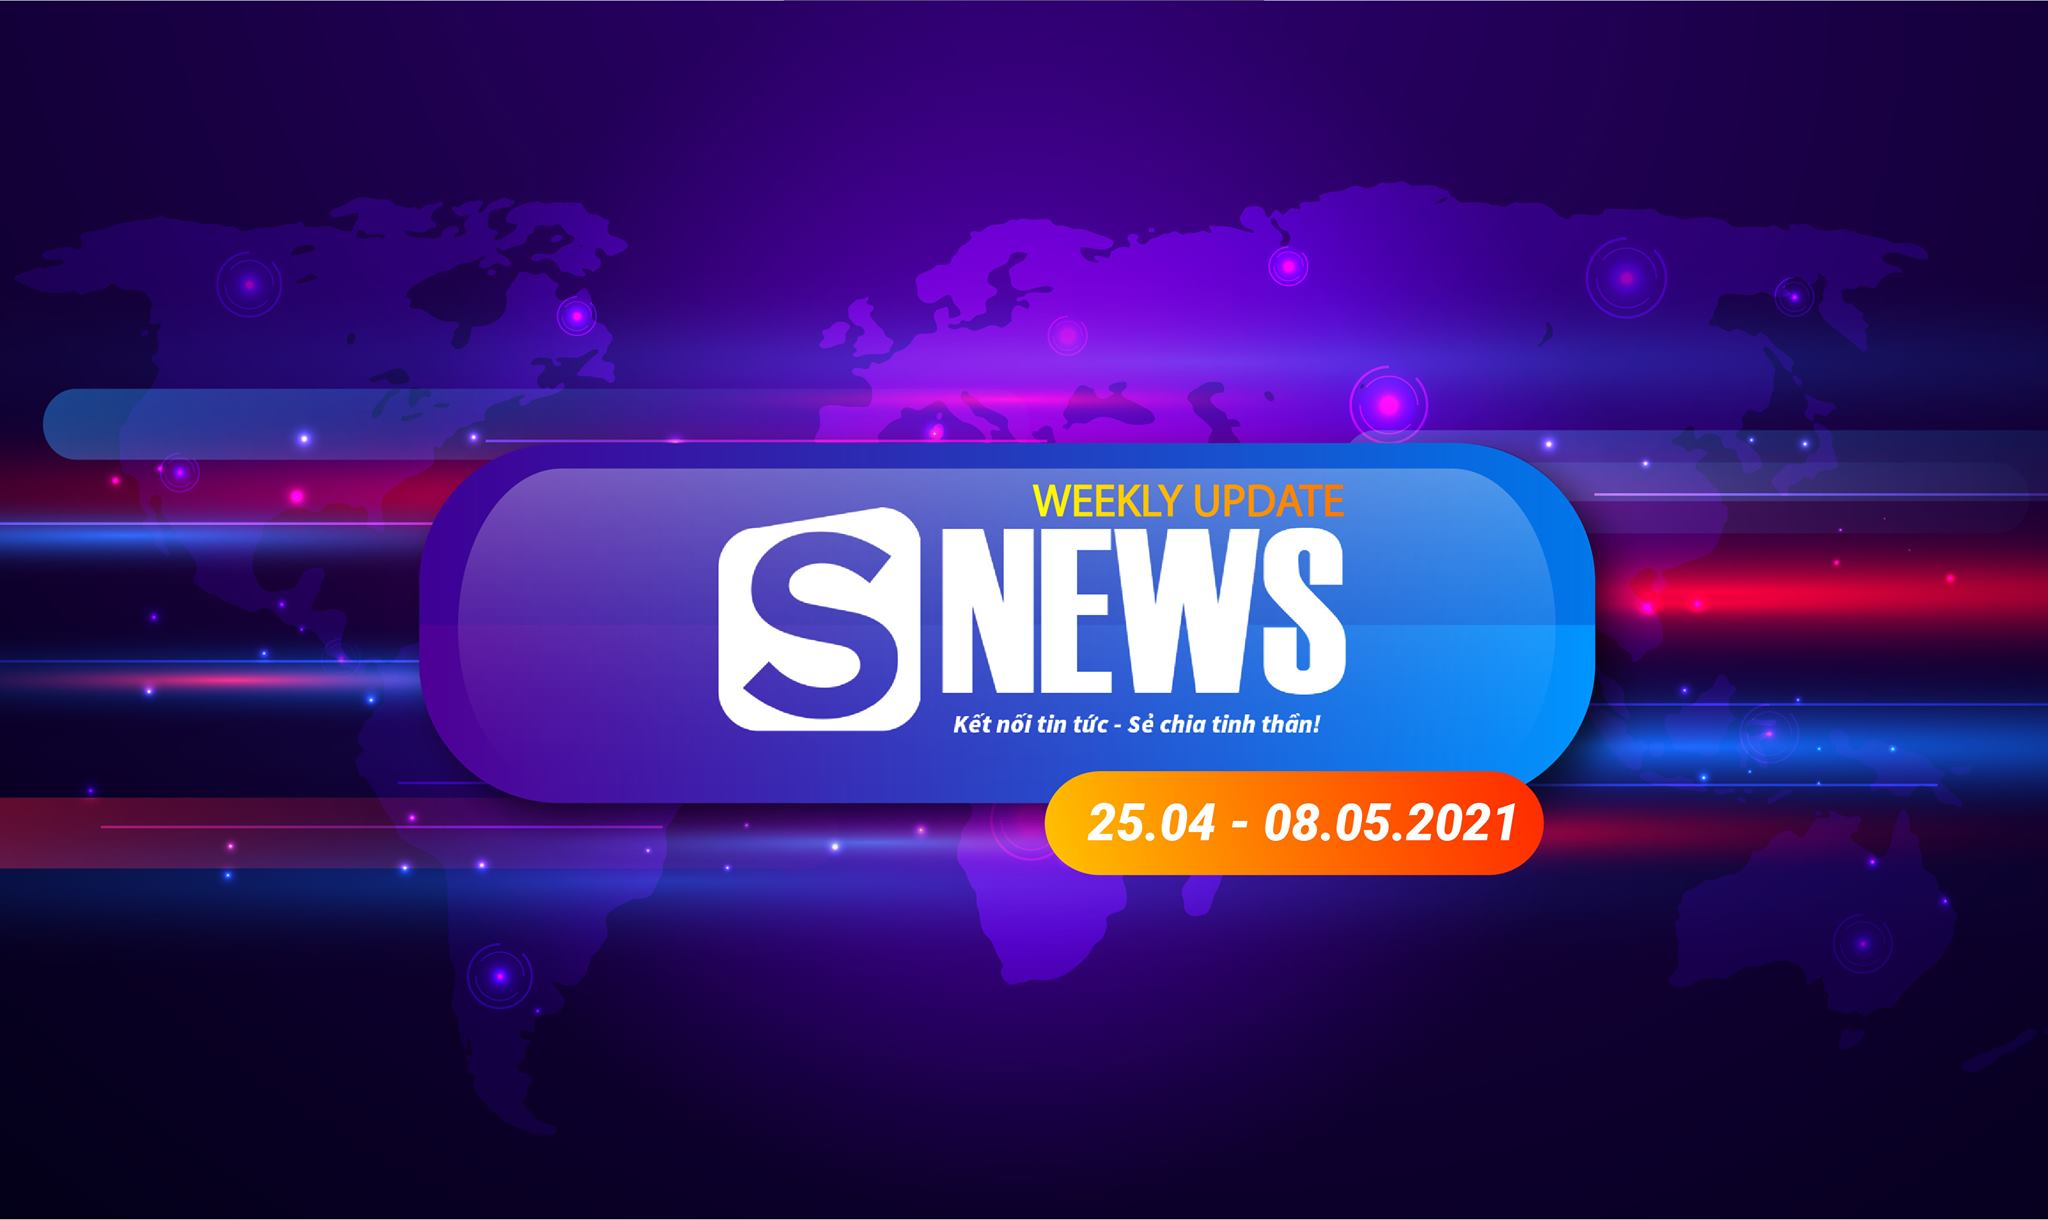 Tổng hợp tin tức Sapo tuần qua: 25.04 - 08.05.2021